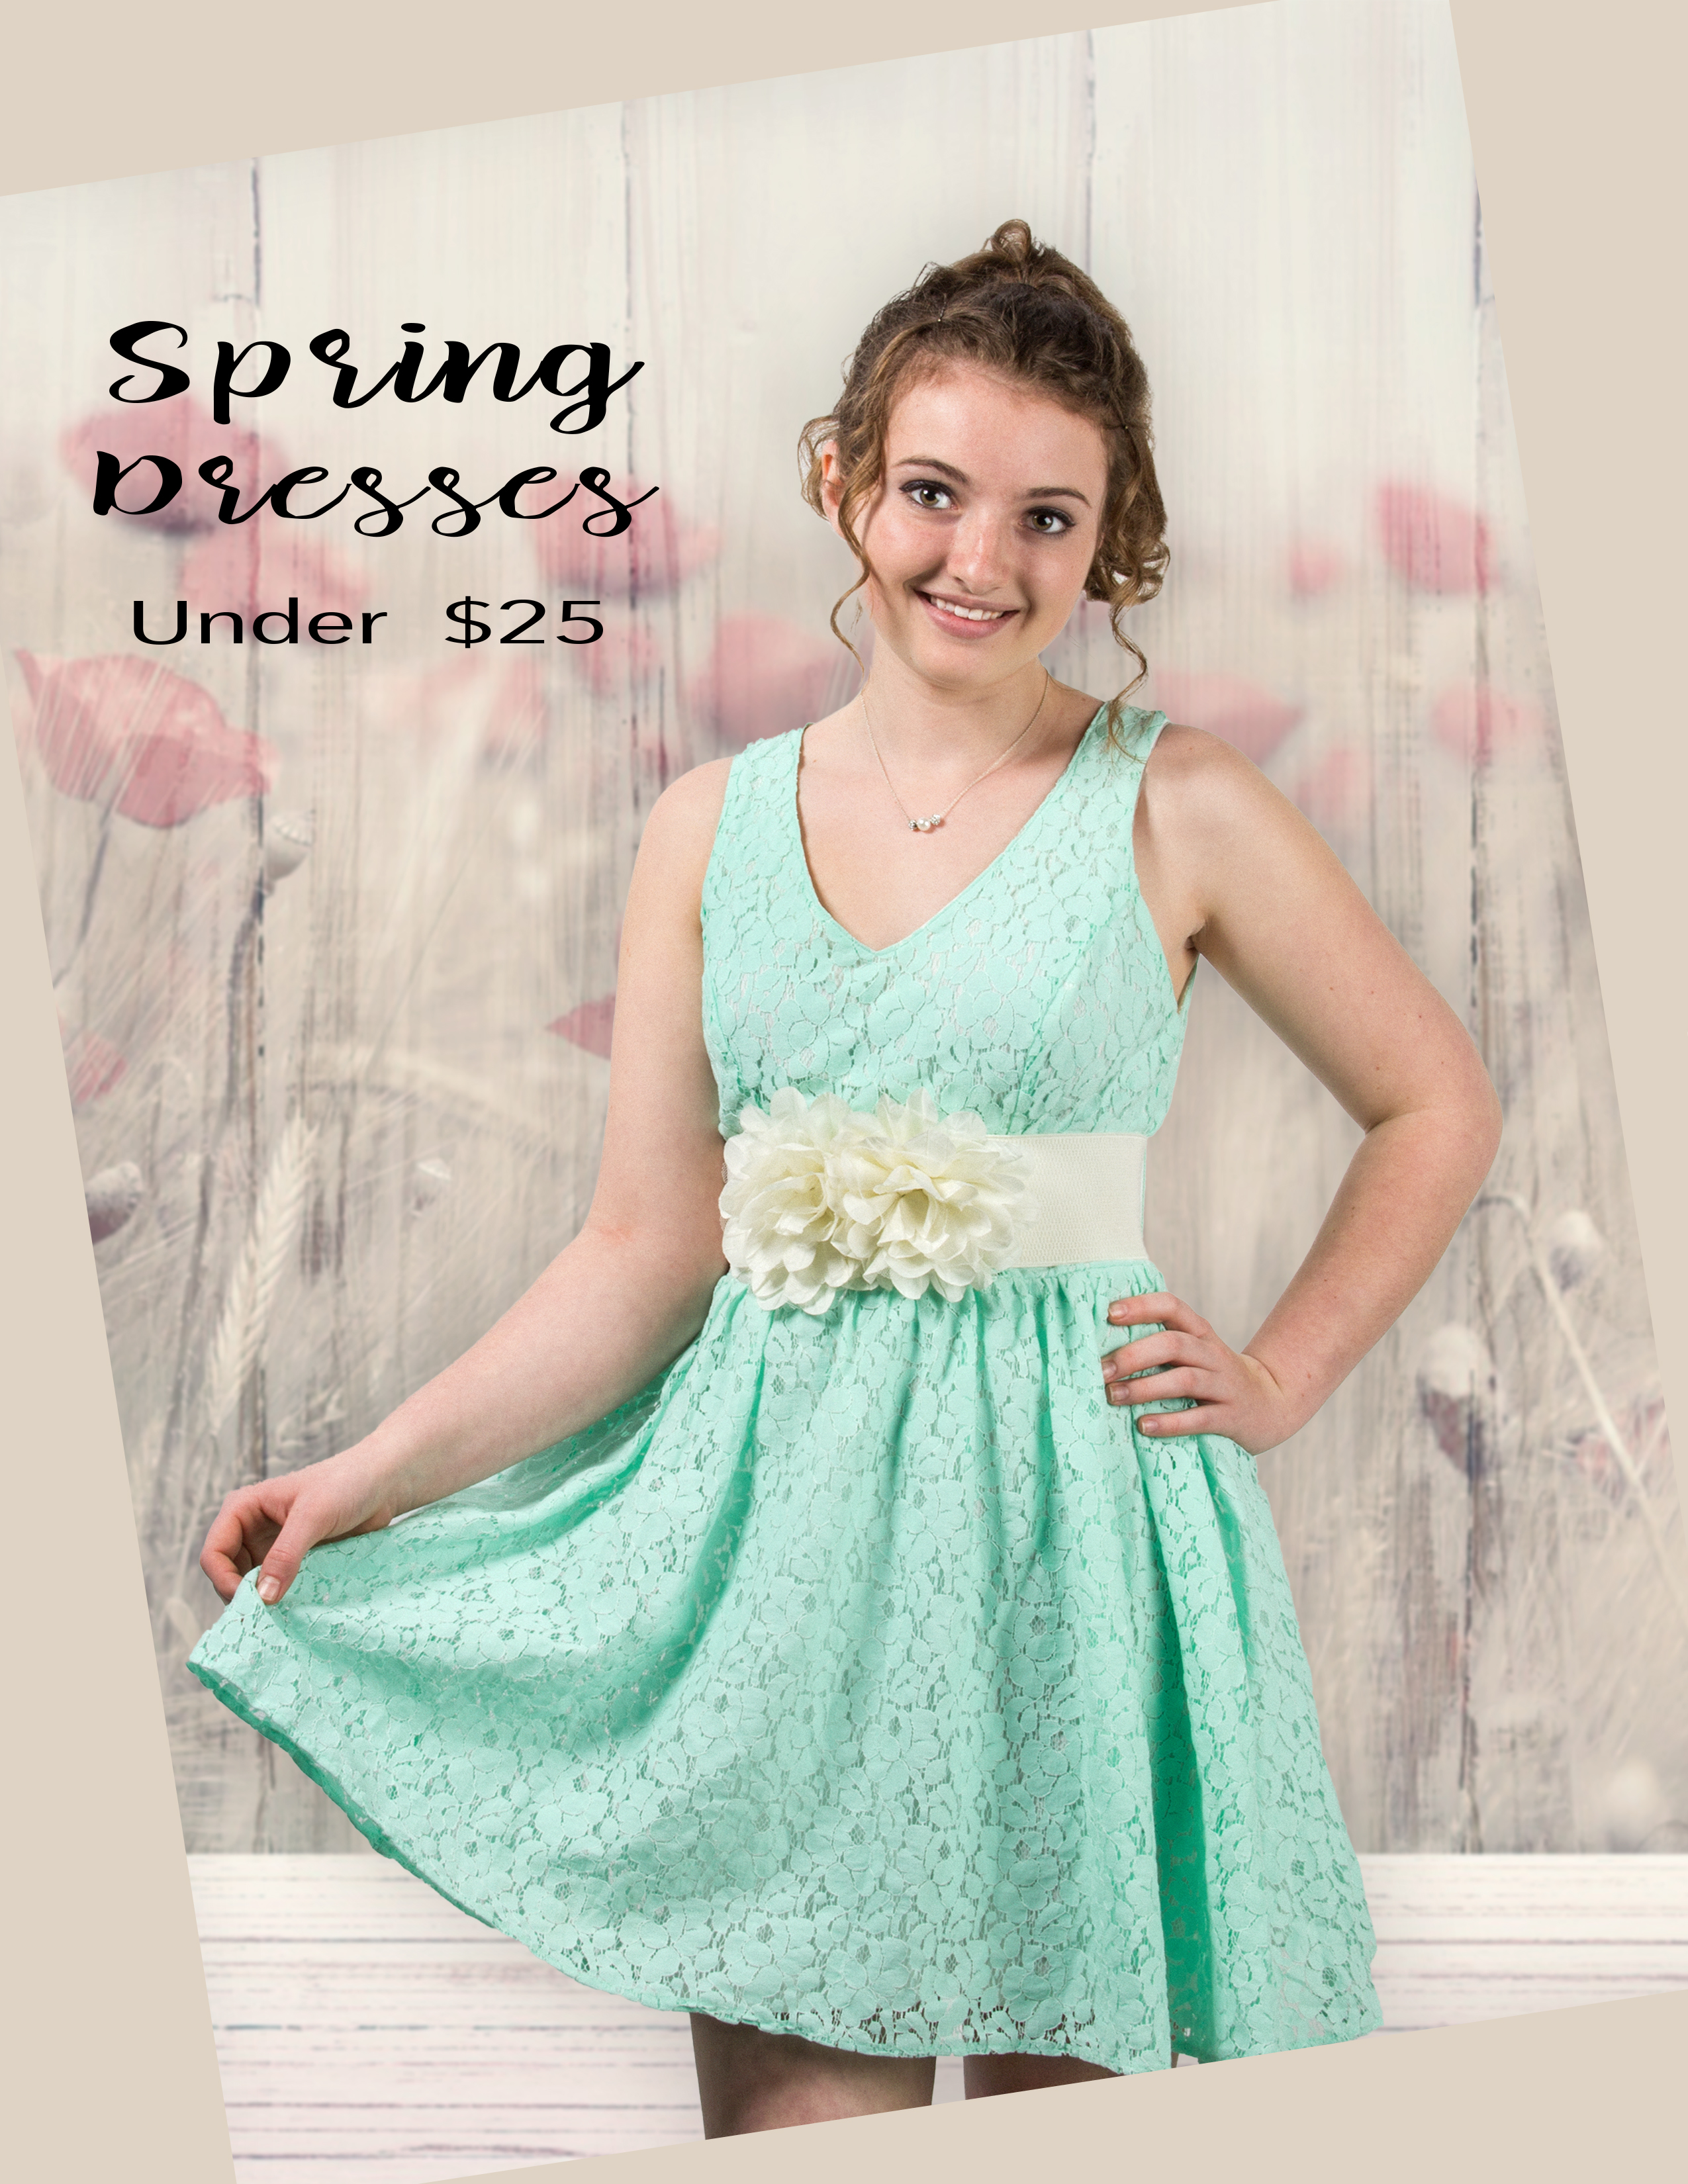 Dress Ad